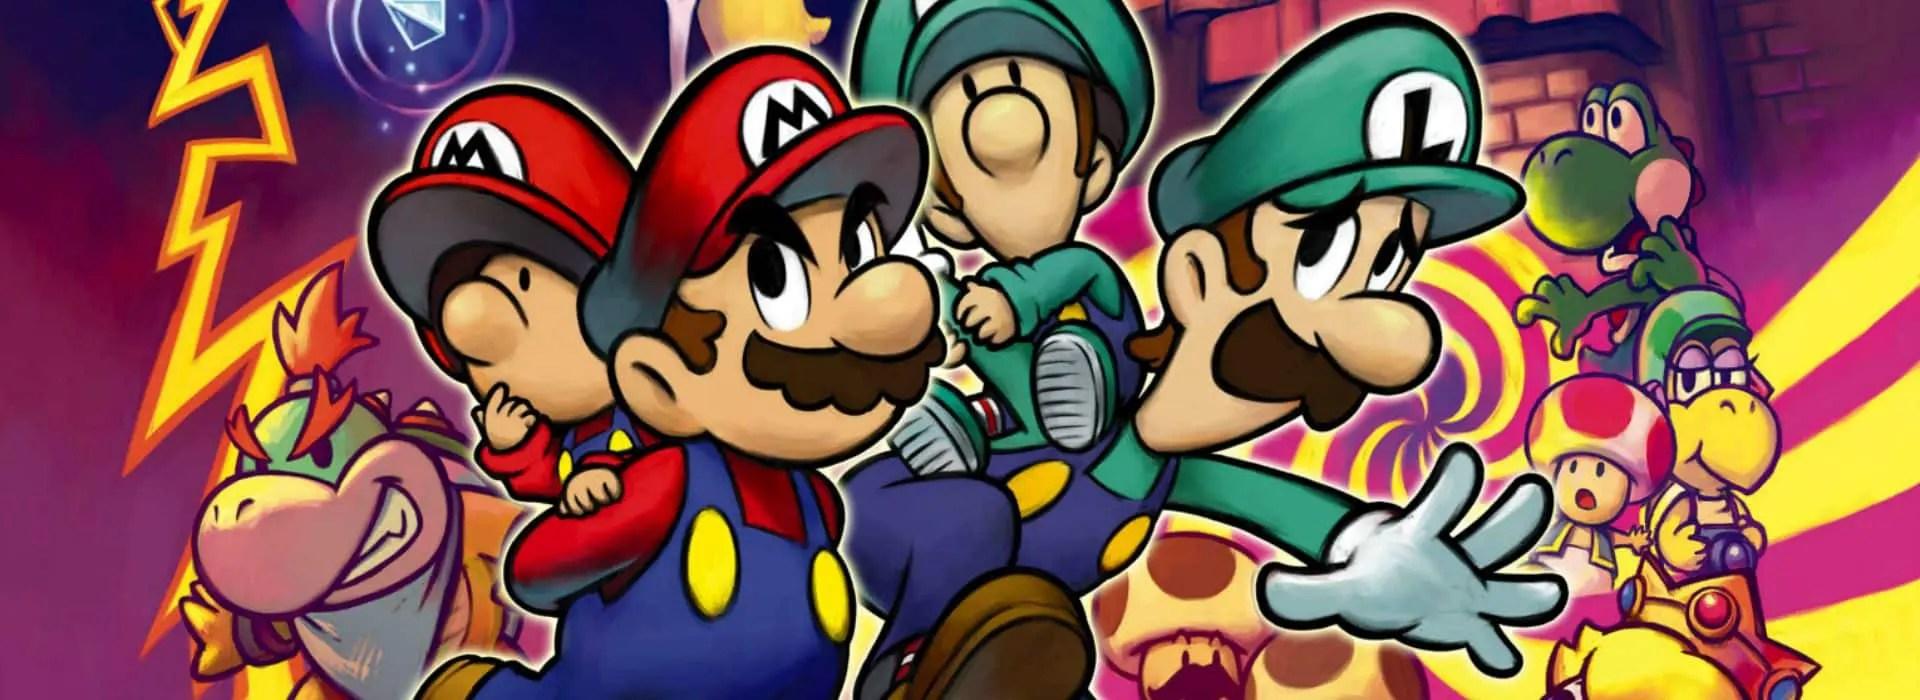 Mario Luigi Partners In Time Review Wii U Nintendo